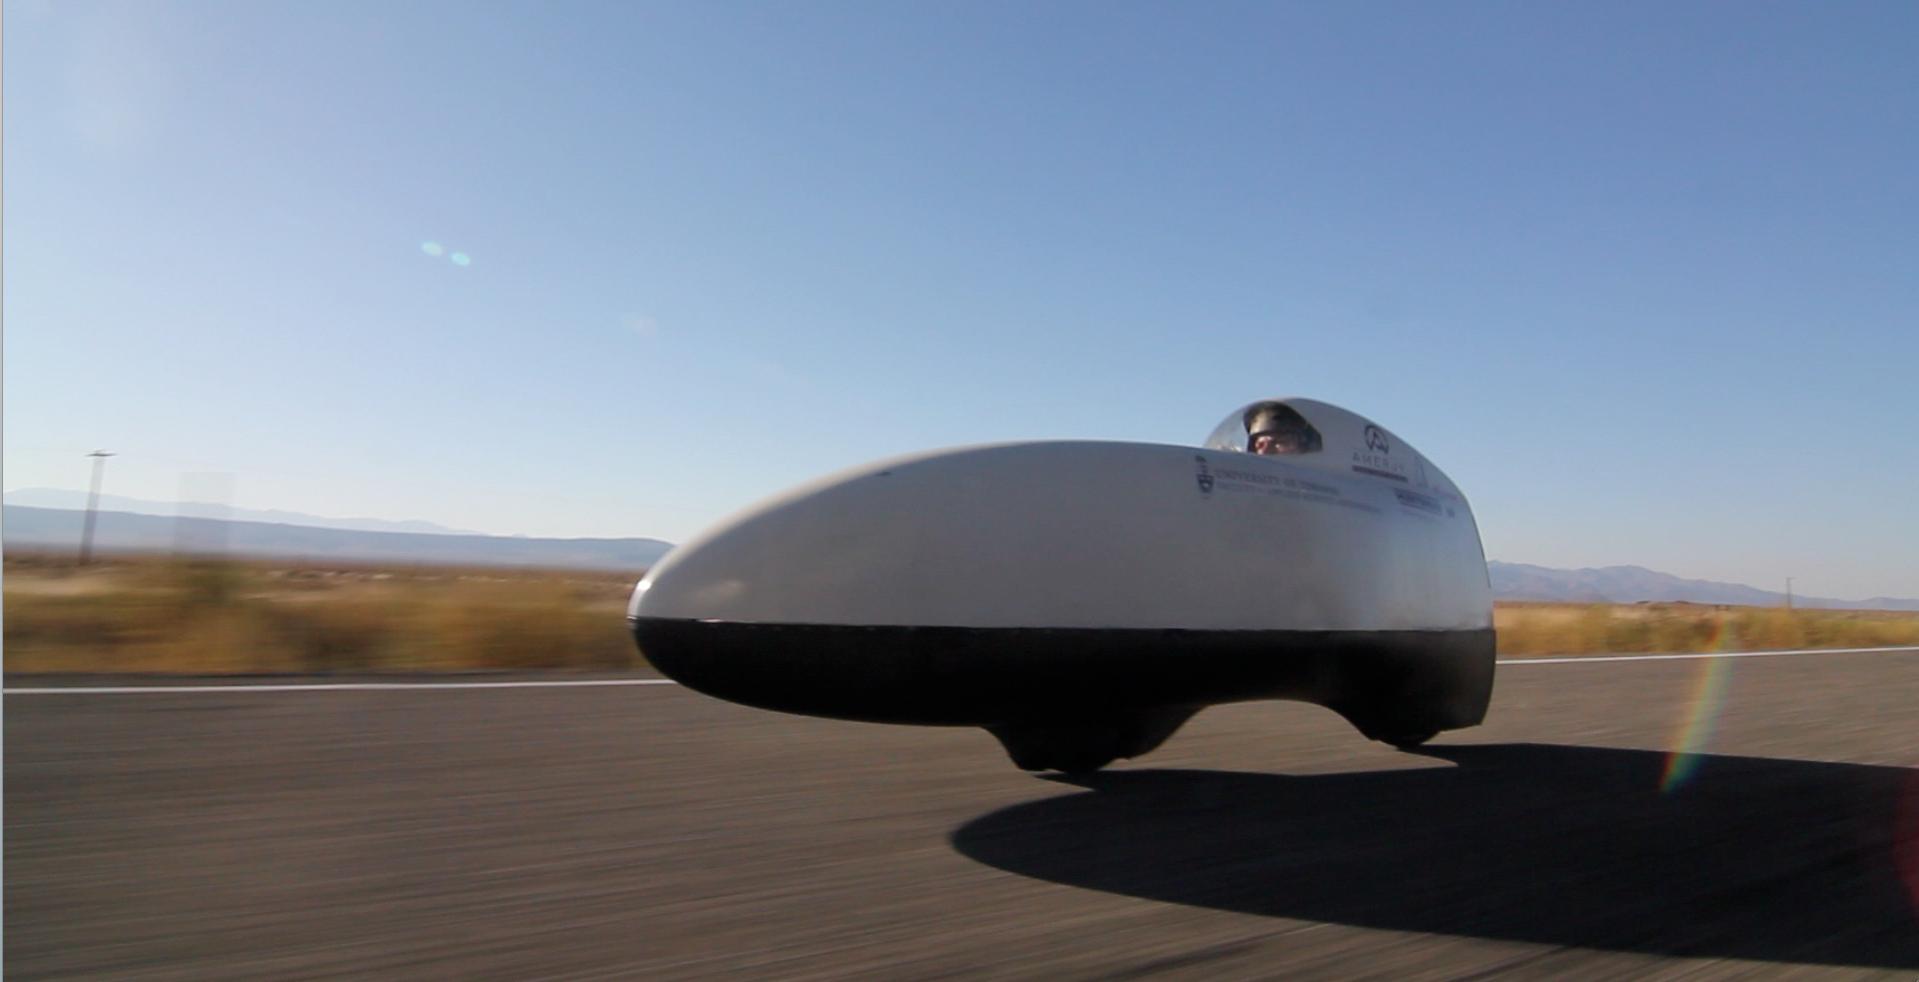 ACE (2010) Top Speed: 101.85 km/hr